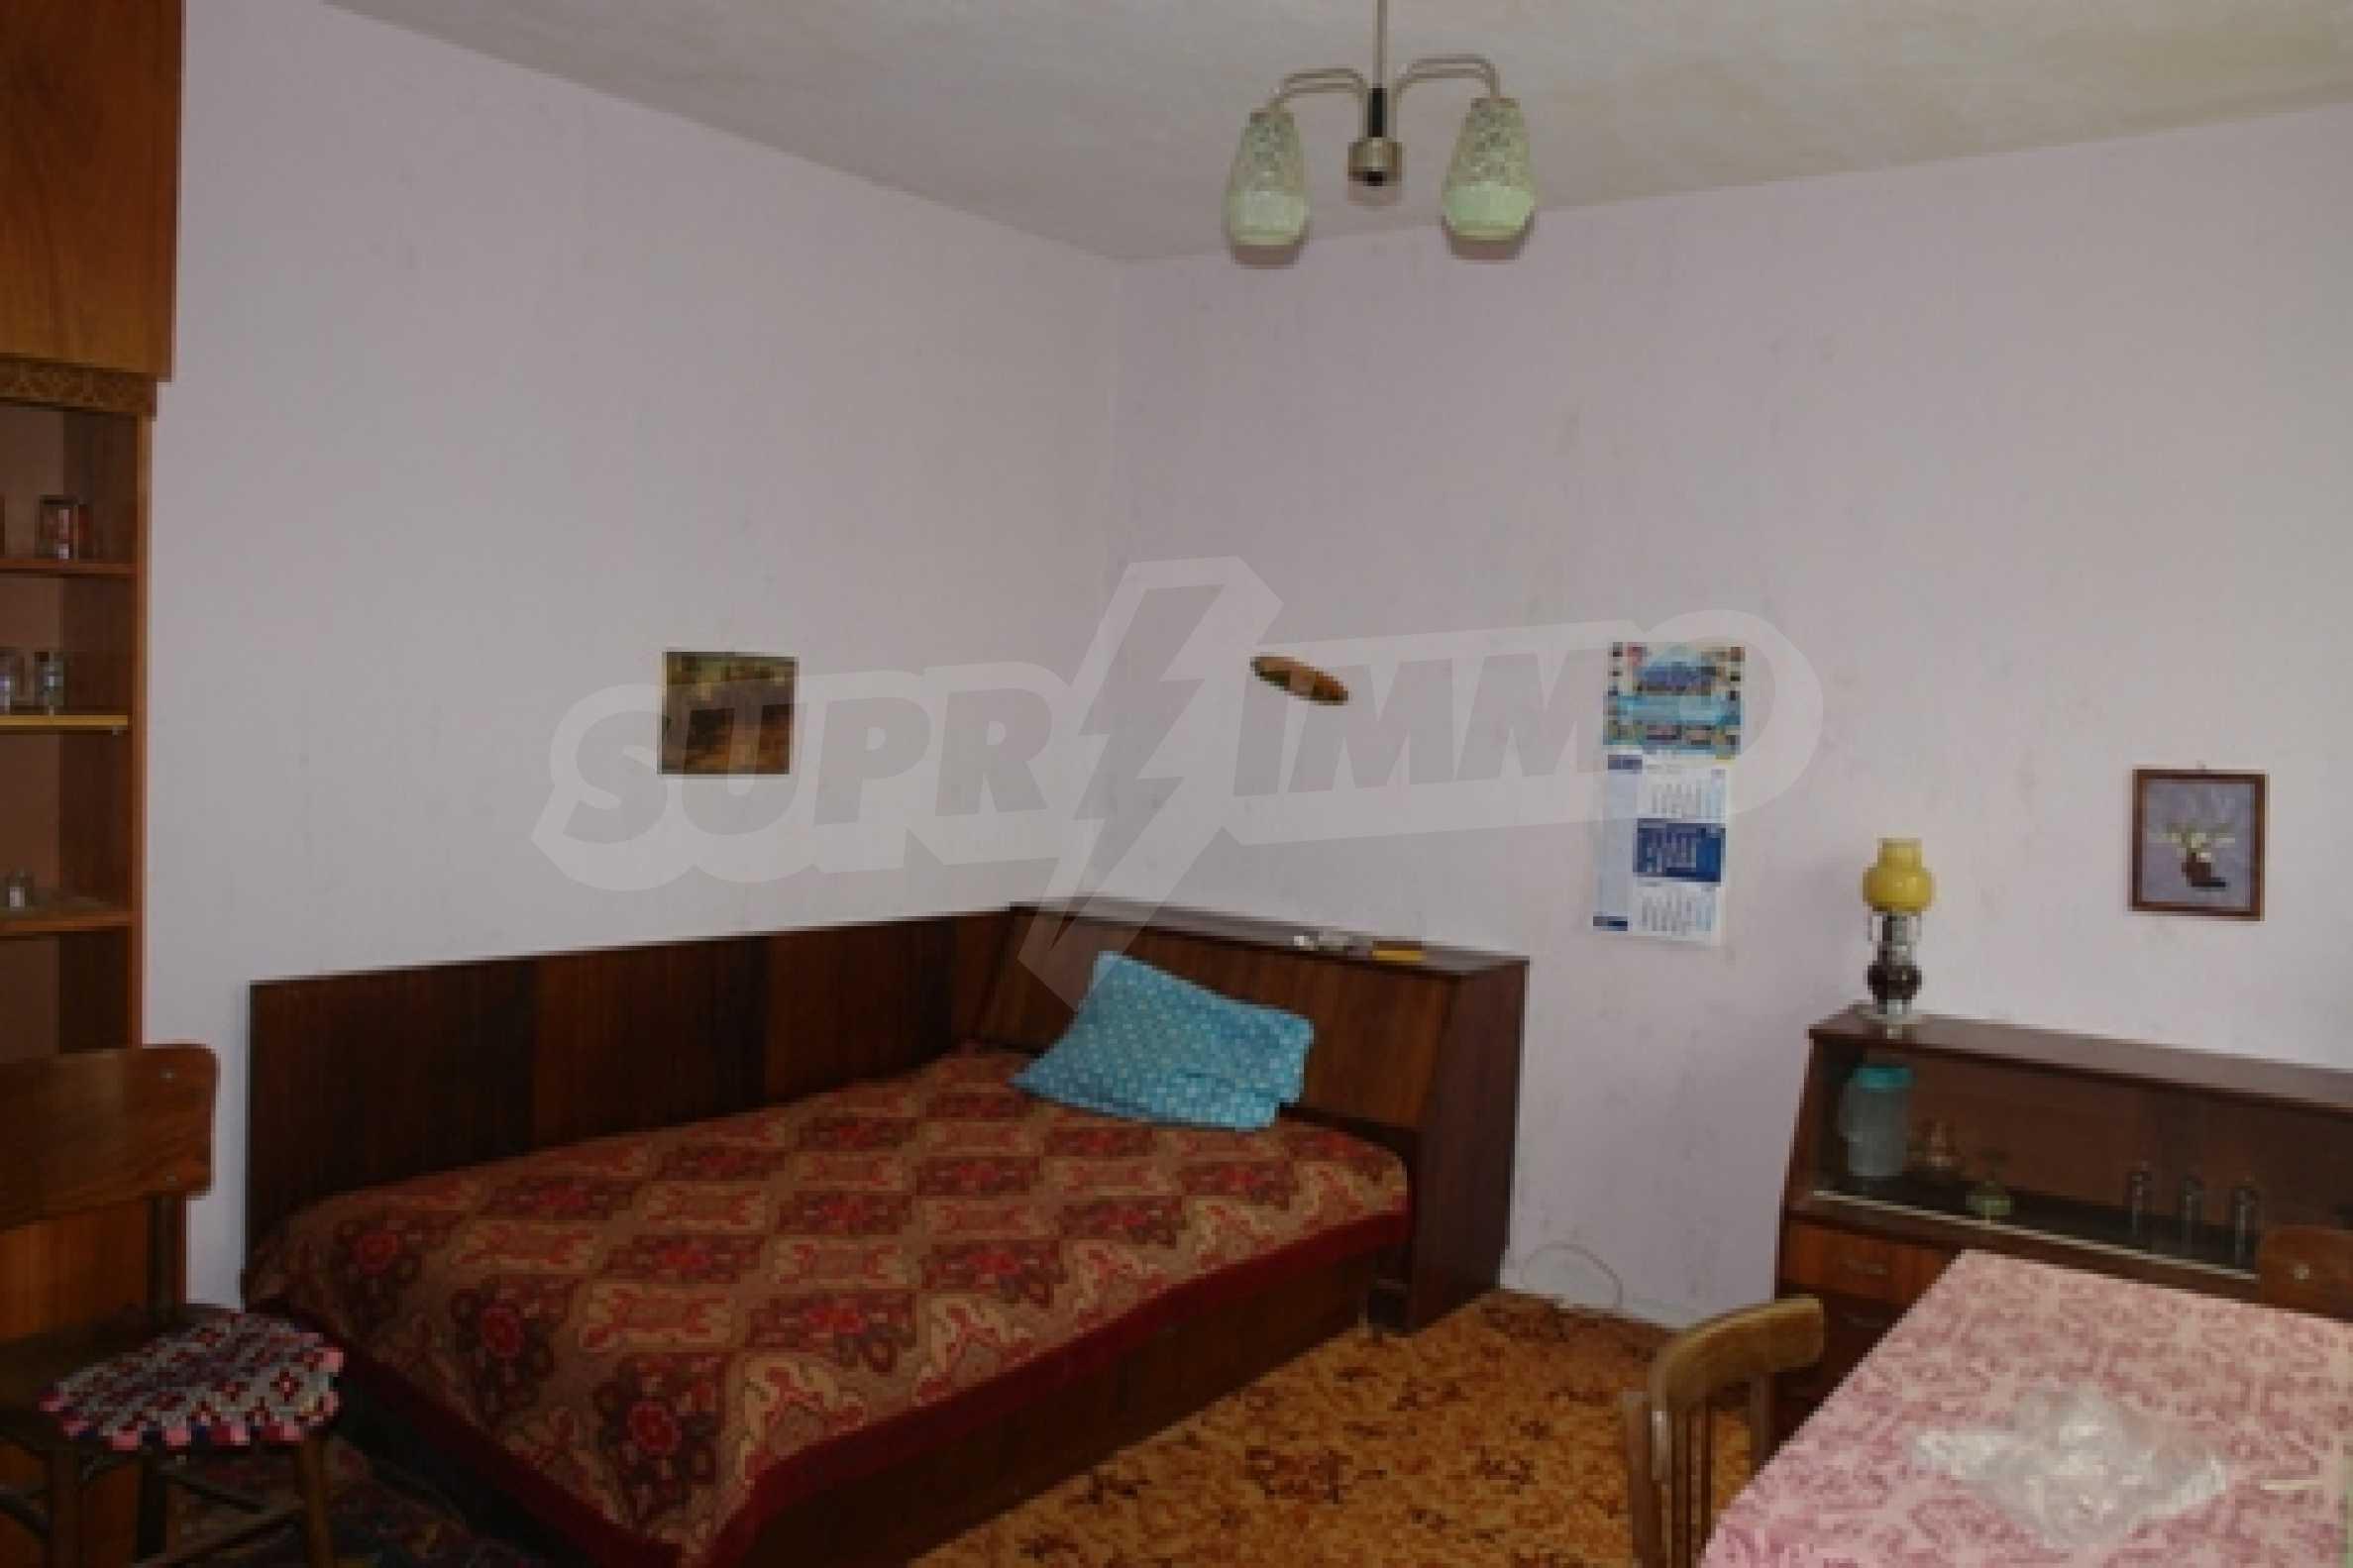 Spacious two-storey 4-bedroom house in Trastenik village, Ruse district 9